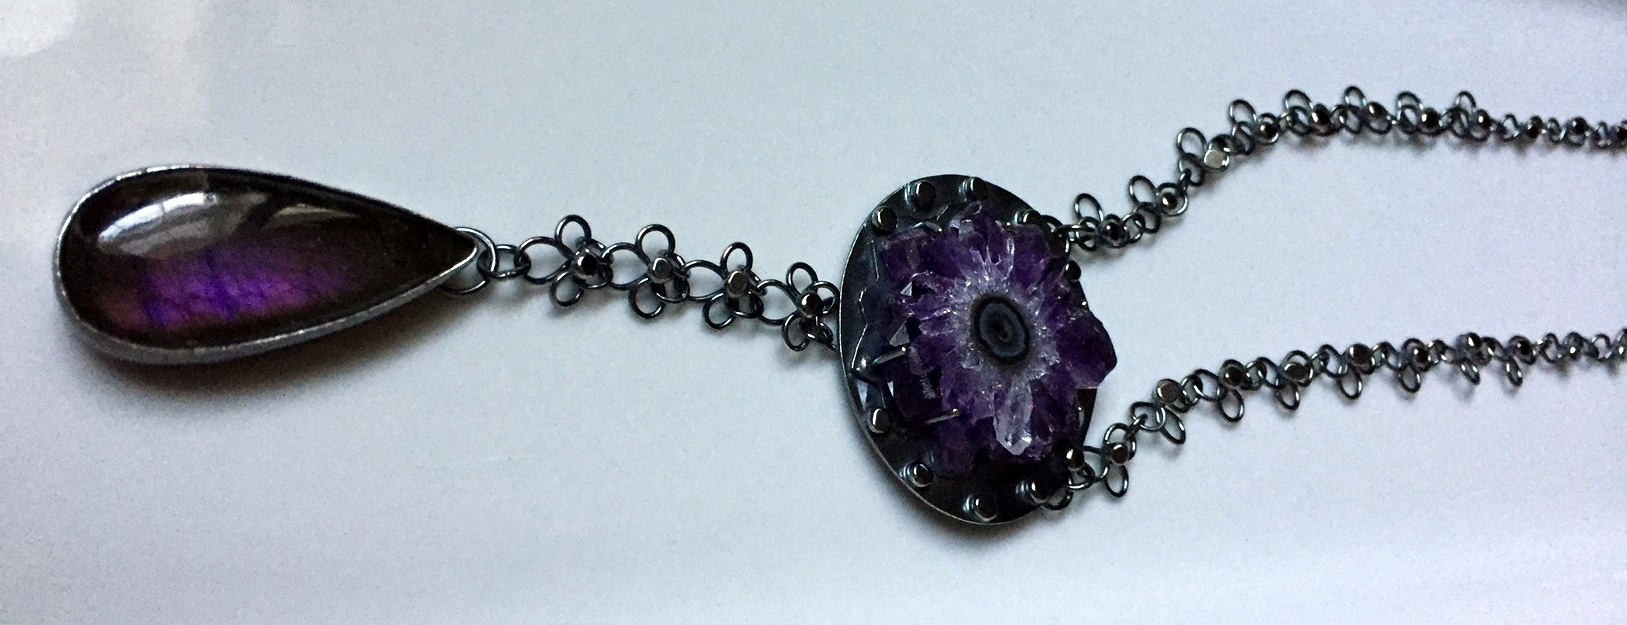 Violet Vengeance Jewelry (@violetvengeance) Cover Image